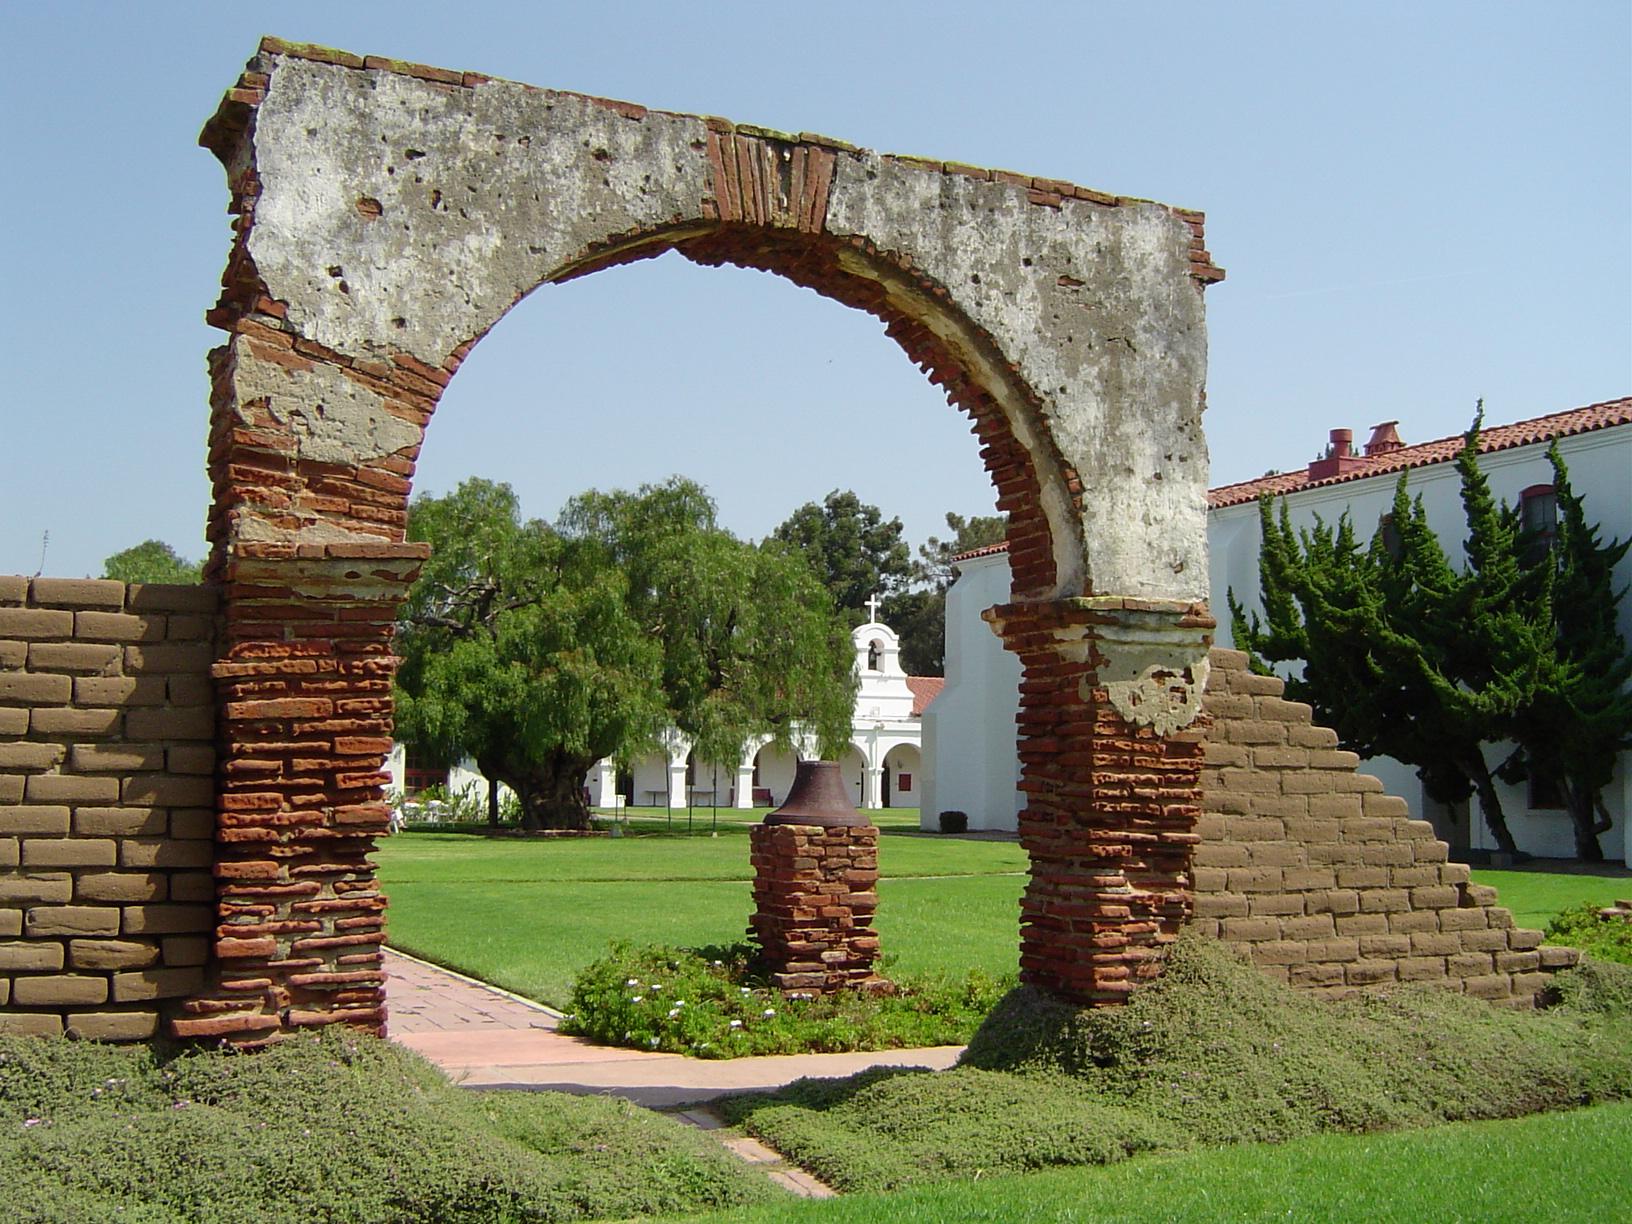 Mission San Gabriel | The Enchanted Manor